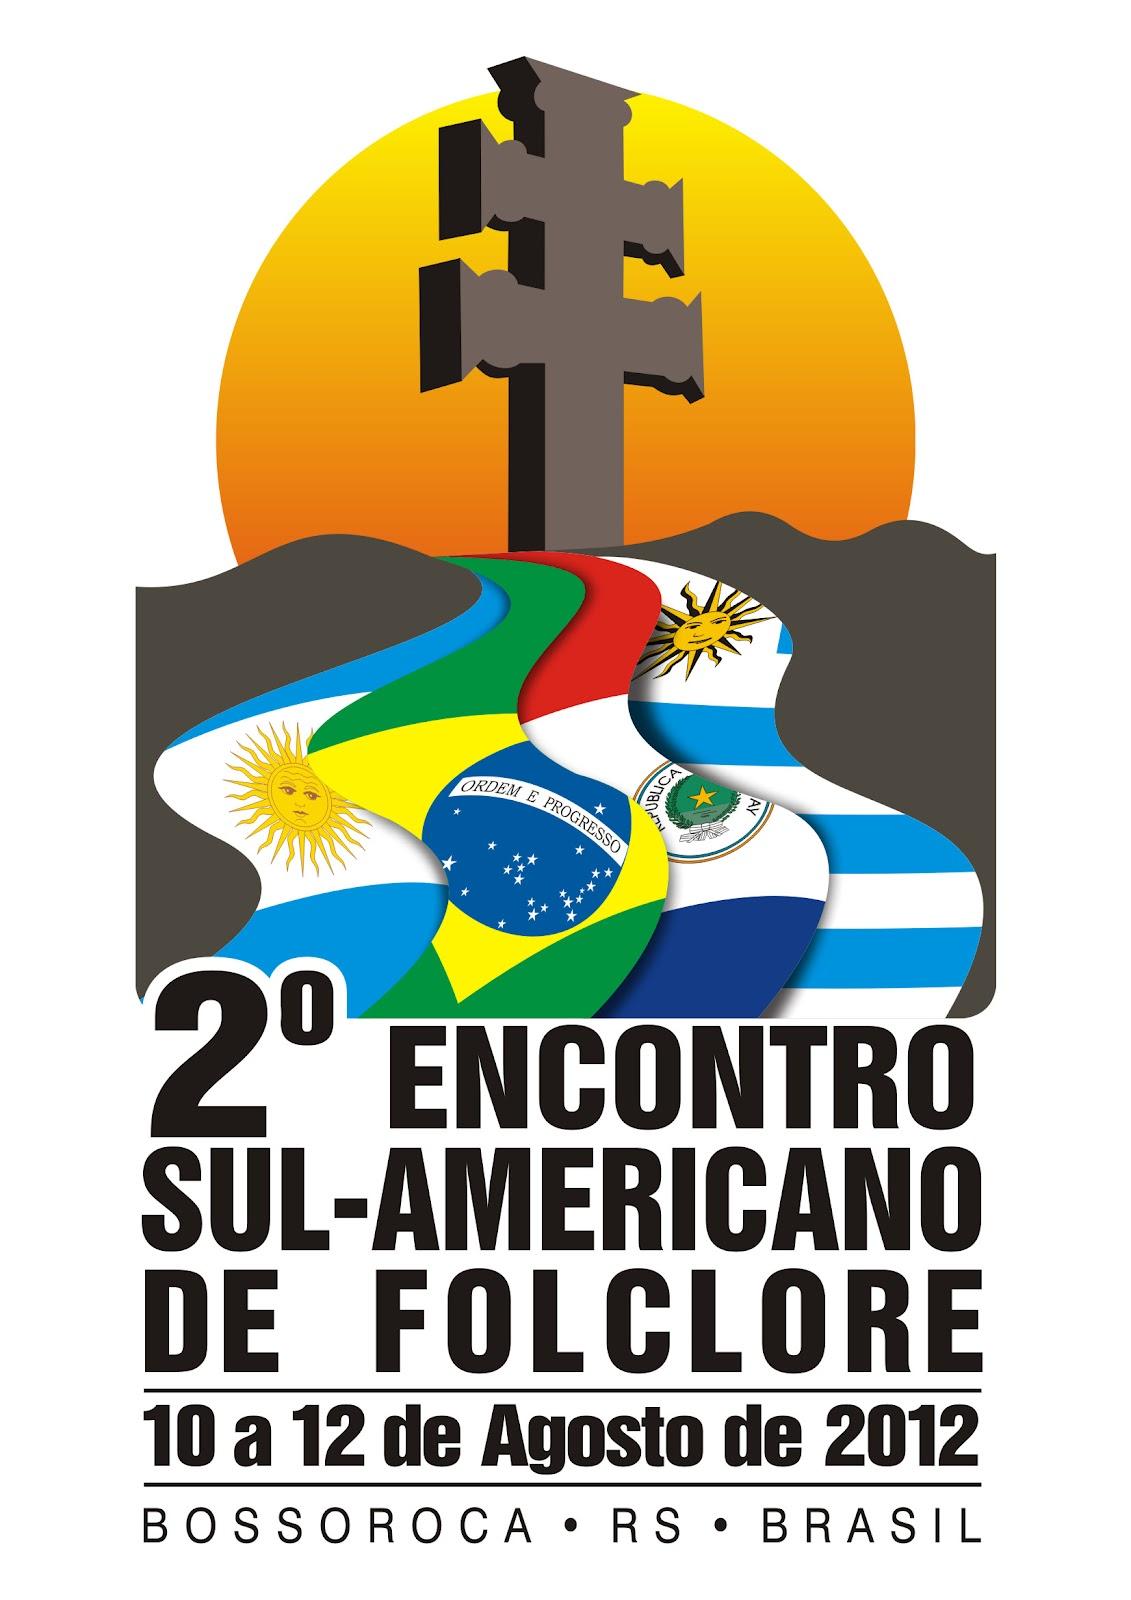 2º_Encontro_Sulamericano_de_Folclore